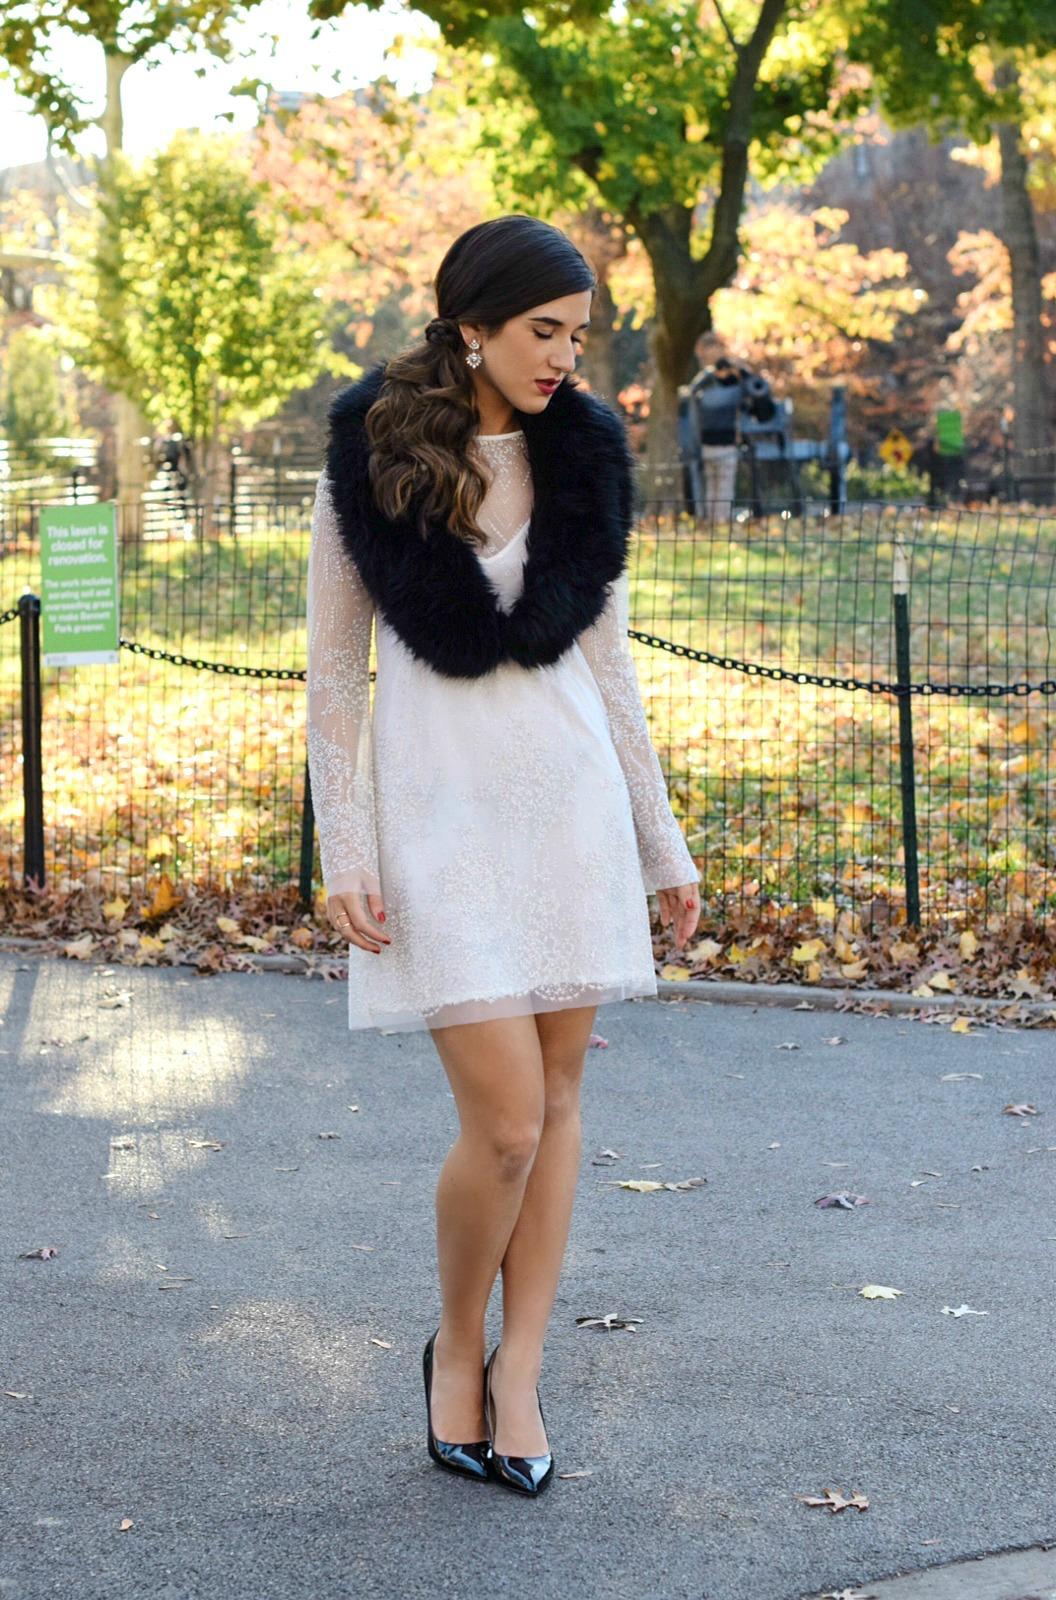 Holiday Look White Glitter Dress Elahn Jewels Louboutins & Love Fashion Blog Esther Santer NYC Street Style Blogger Diamond Rings.jpg